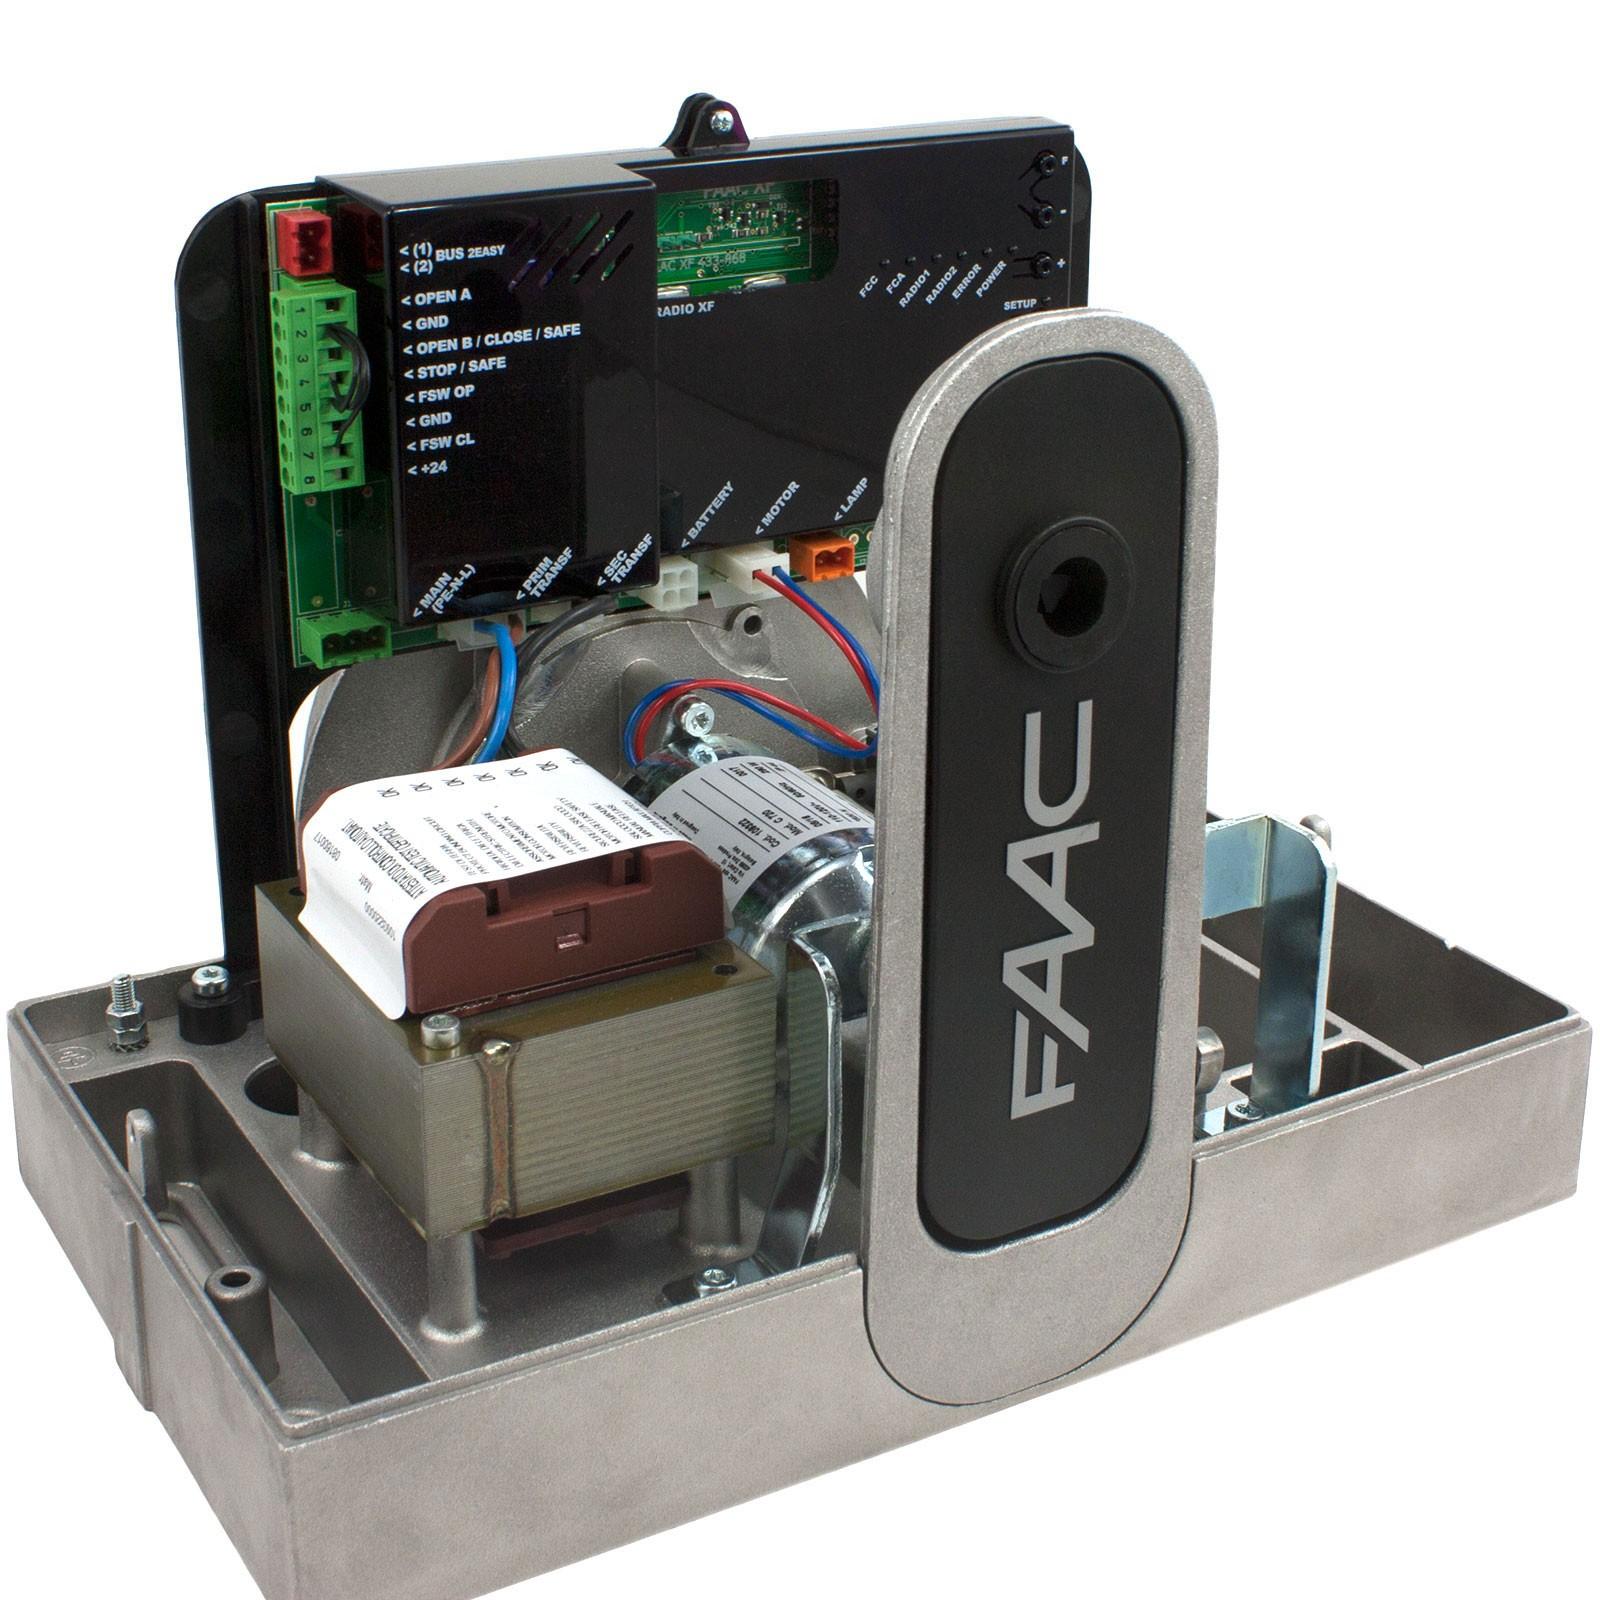 c720 low voltage slide gate operator faac 109322 fast. Black Bedroom Furniture Sets. Home Design Ideas